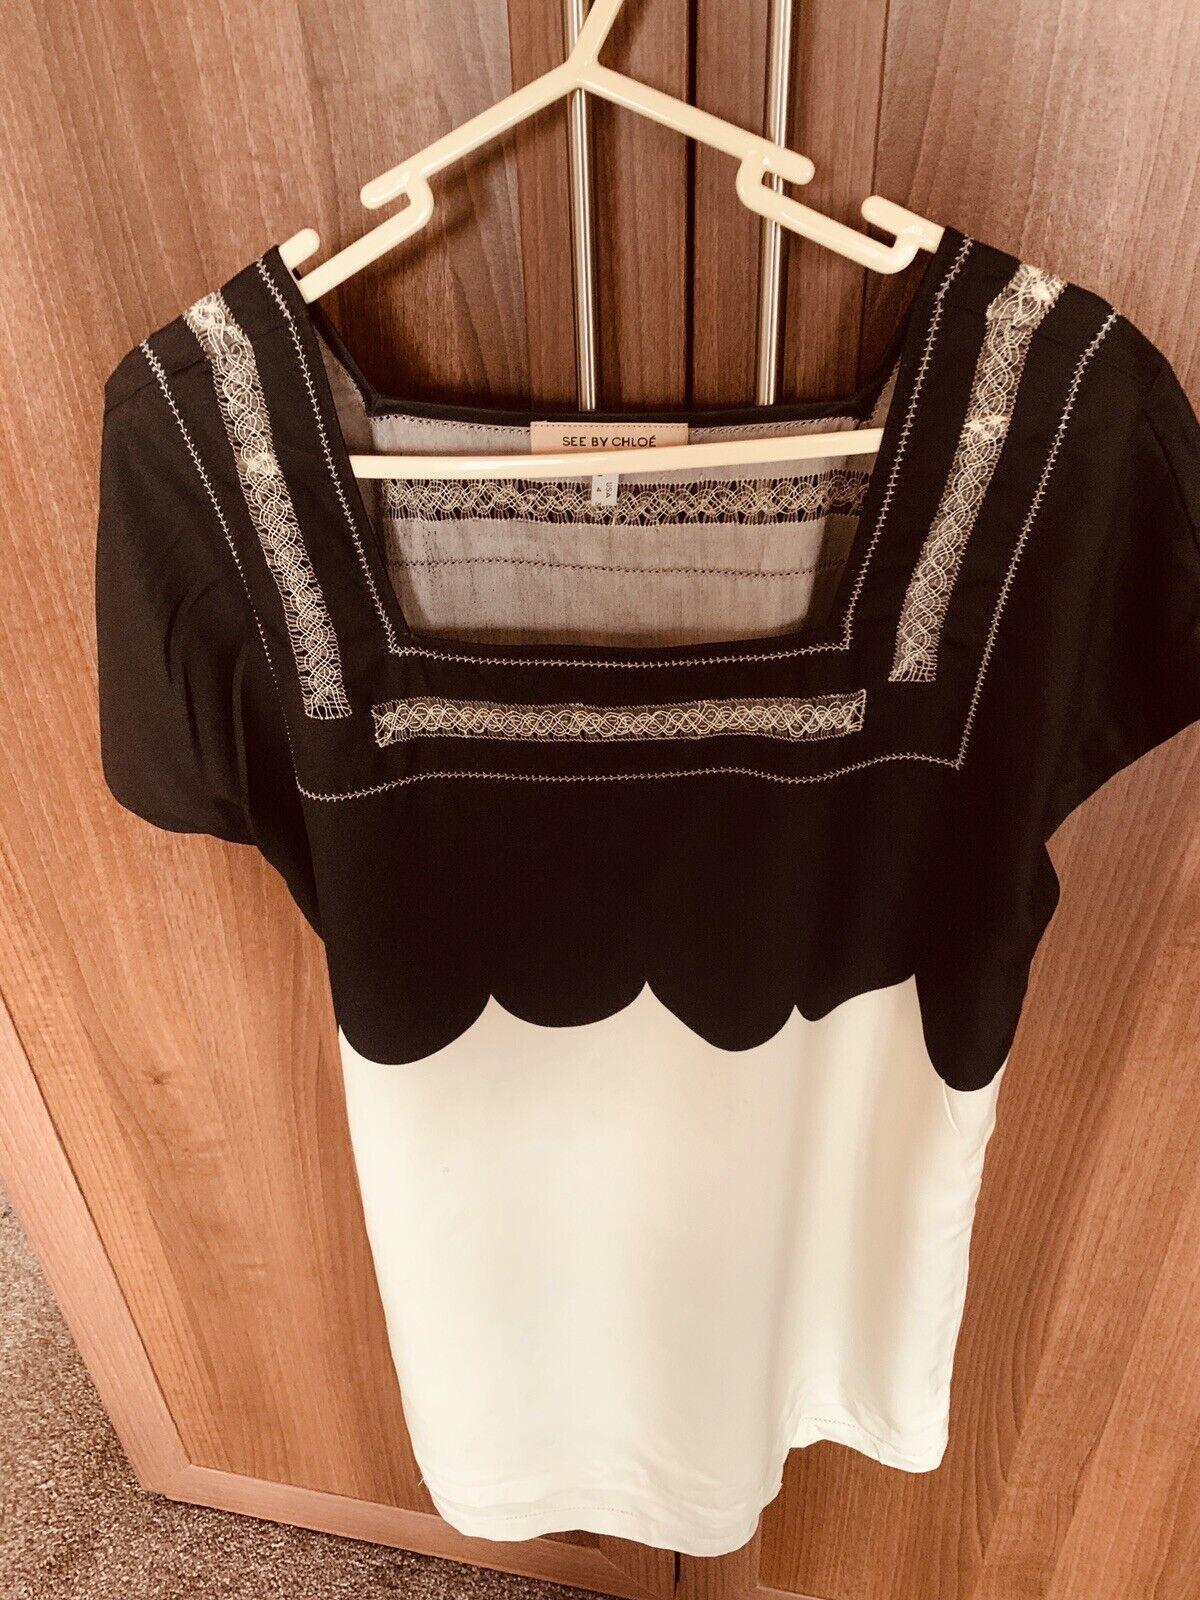 See By Chloe Mono Dress